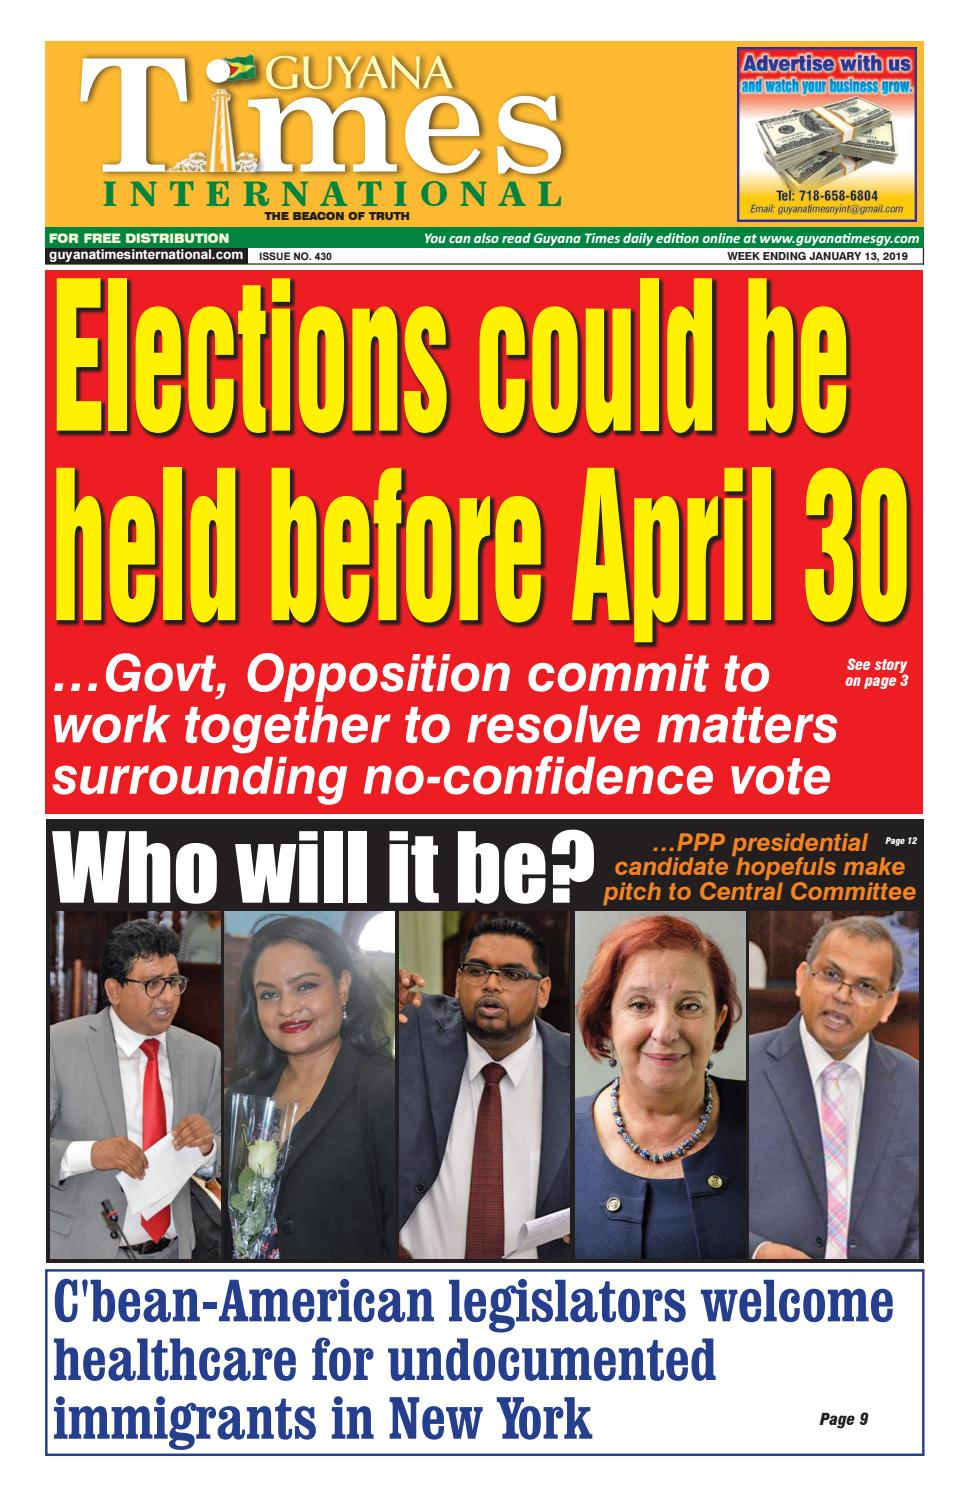 Guyana Times International 11 January 2019 by Gytimes - issuu